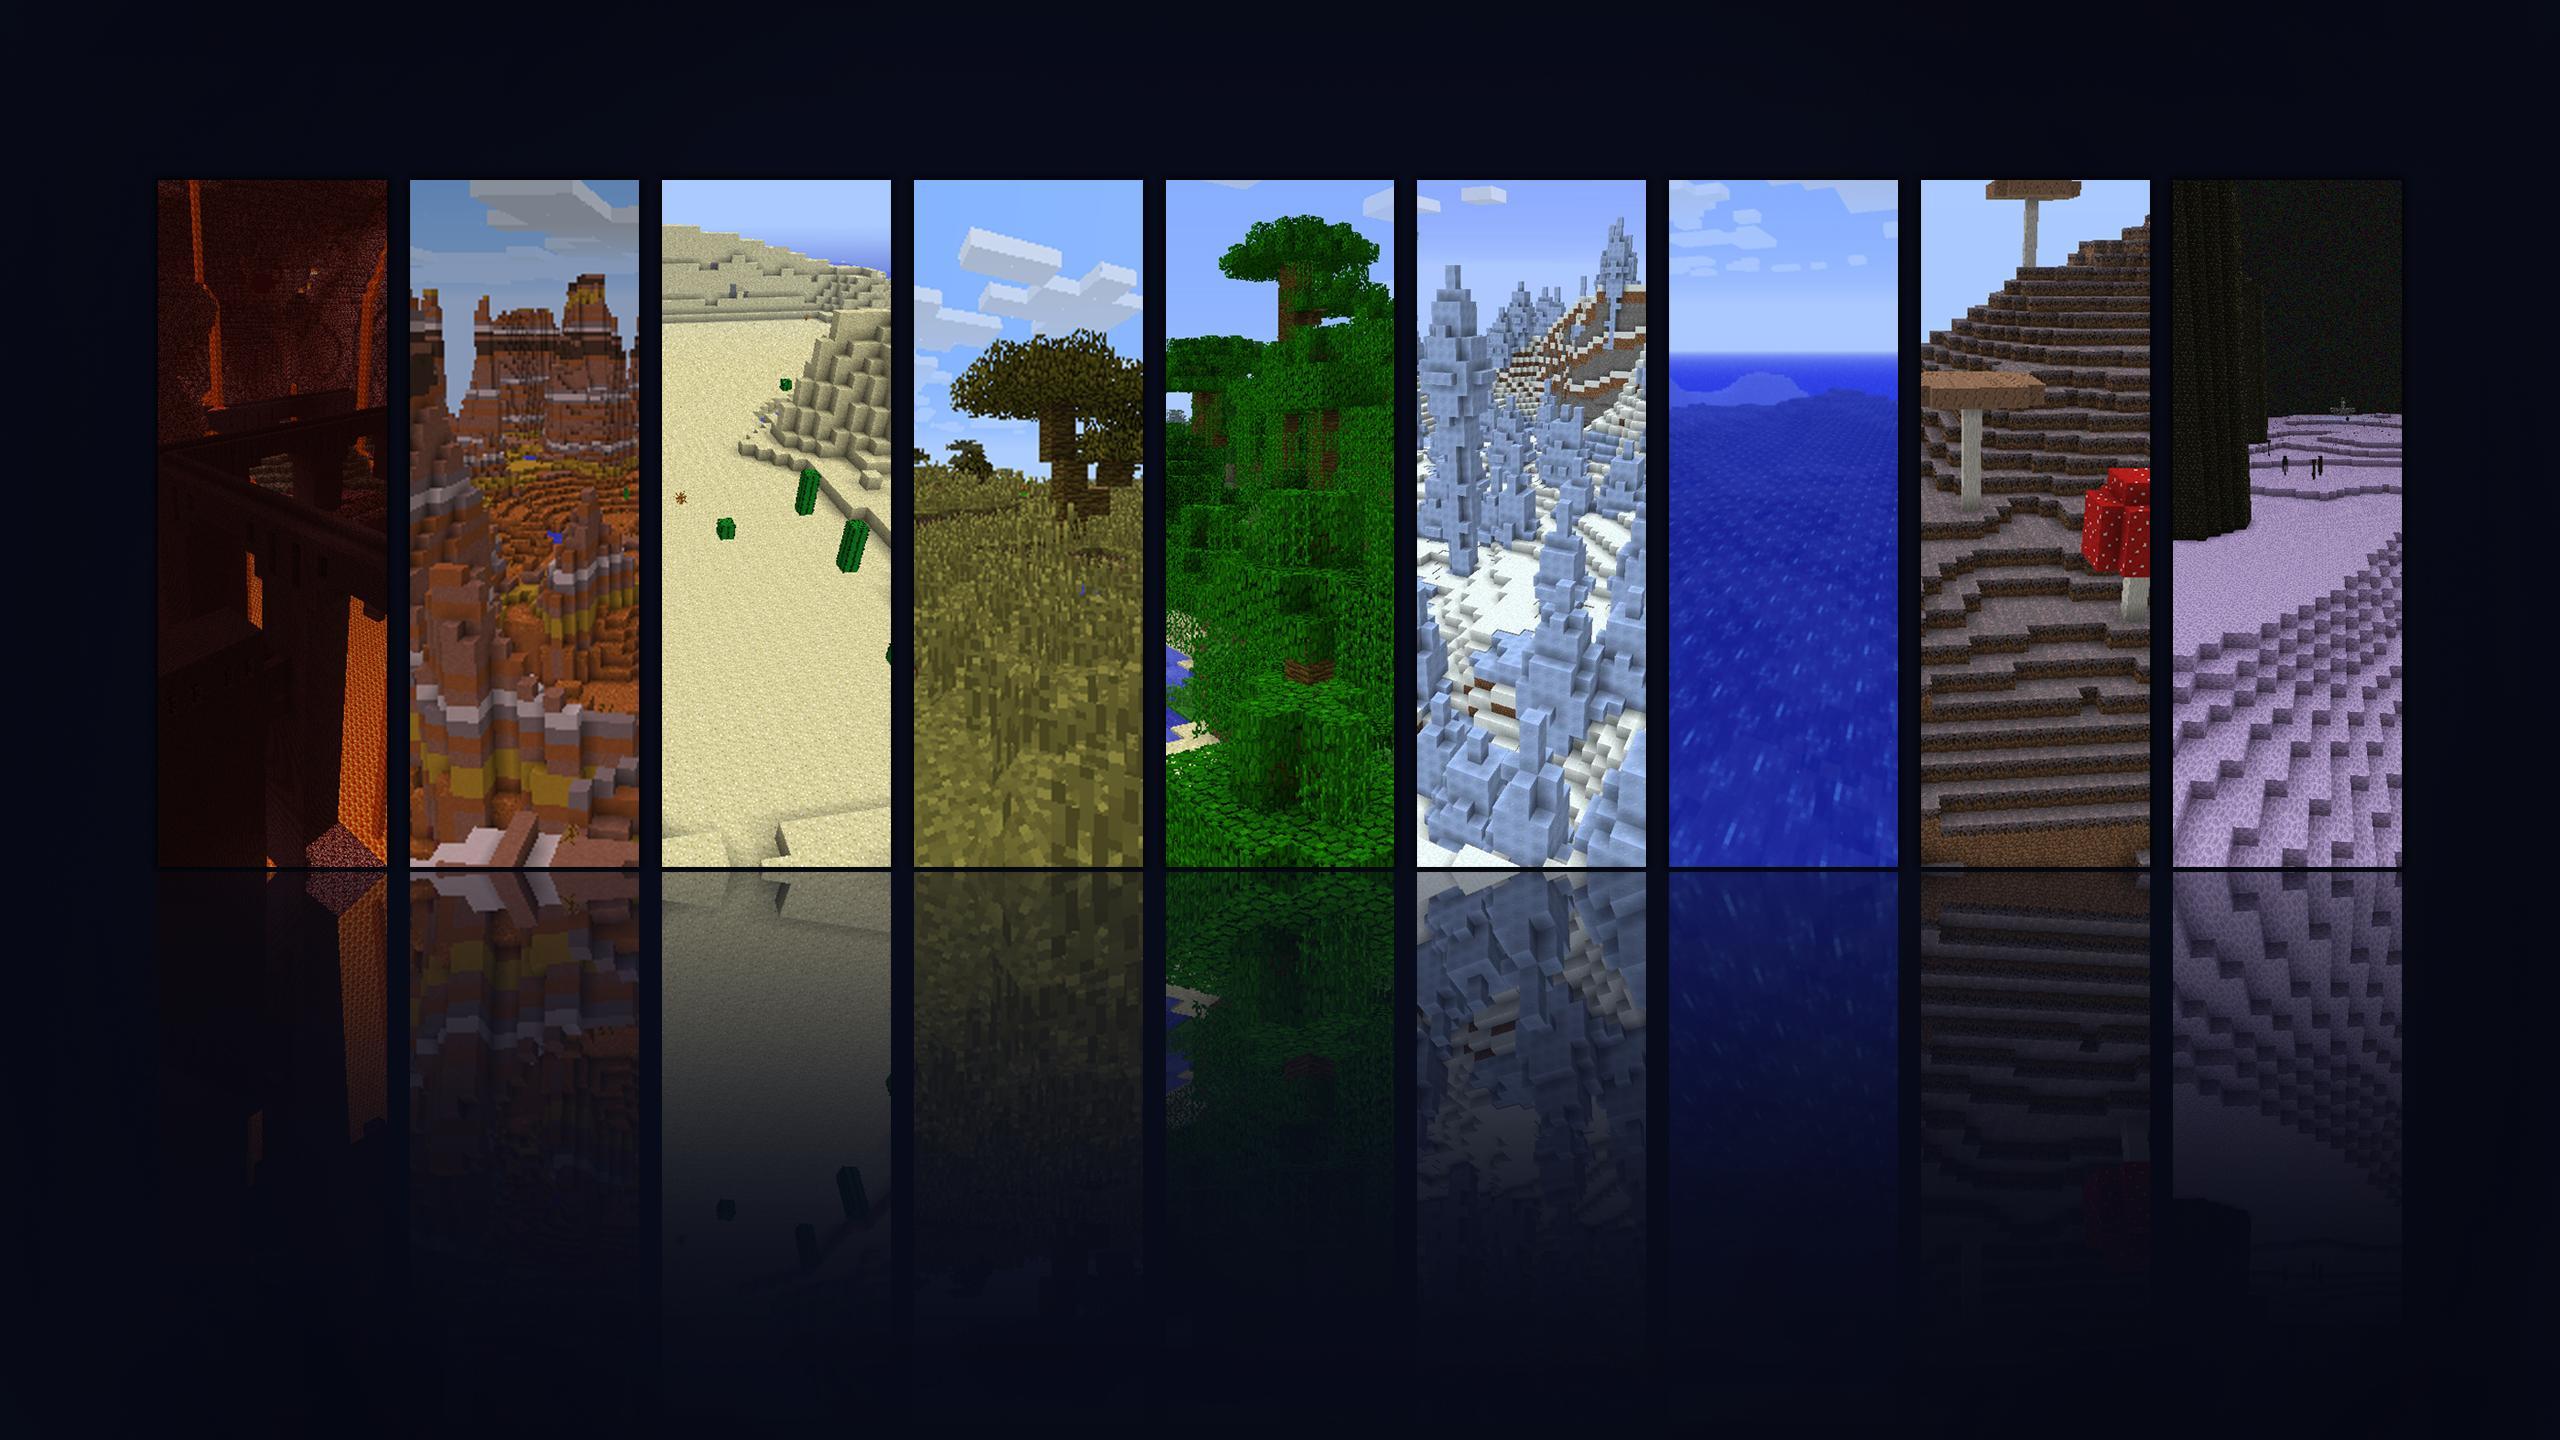 Minecraft Top Wallpapers for your desktop 1920 x 1080 2560x1440